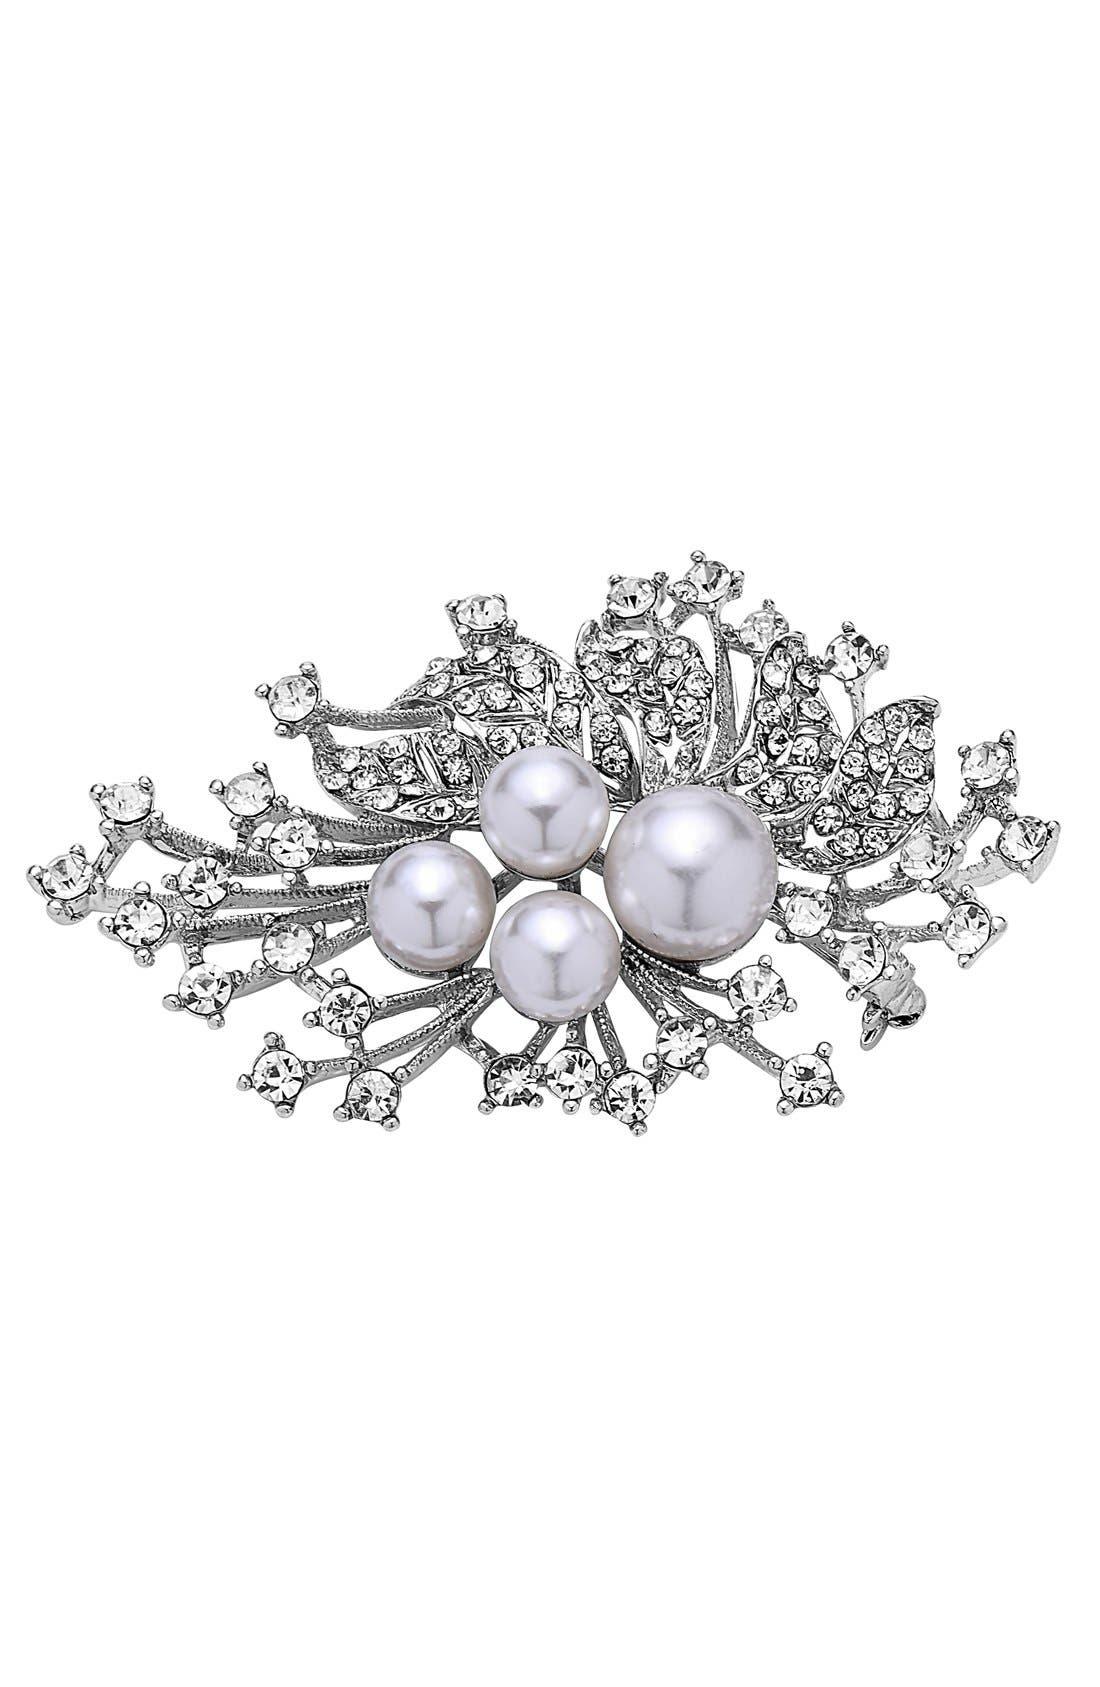 Alternate Image 1 Selected - Nina 'Crystal Spray' Crystal & Faux Pearl Brooch